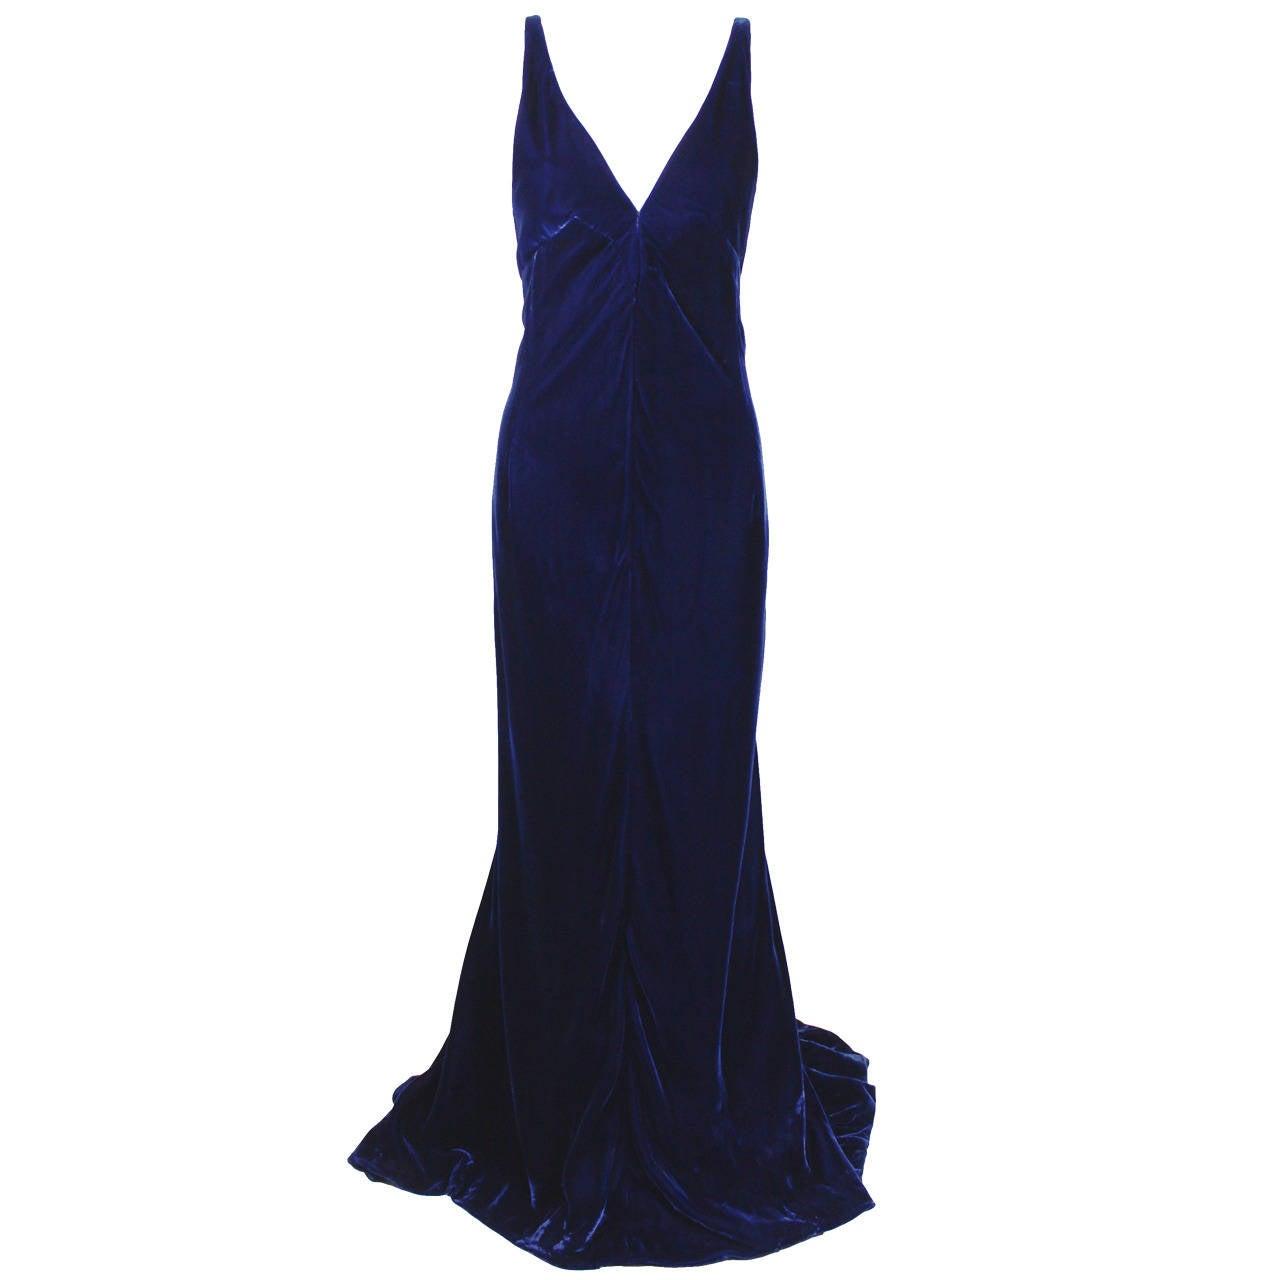 Jacqueline De Ribes Stunning Midnight Blue Velvet Evening Gown For Sale